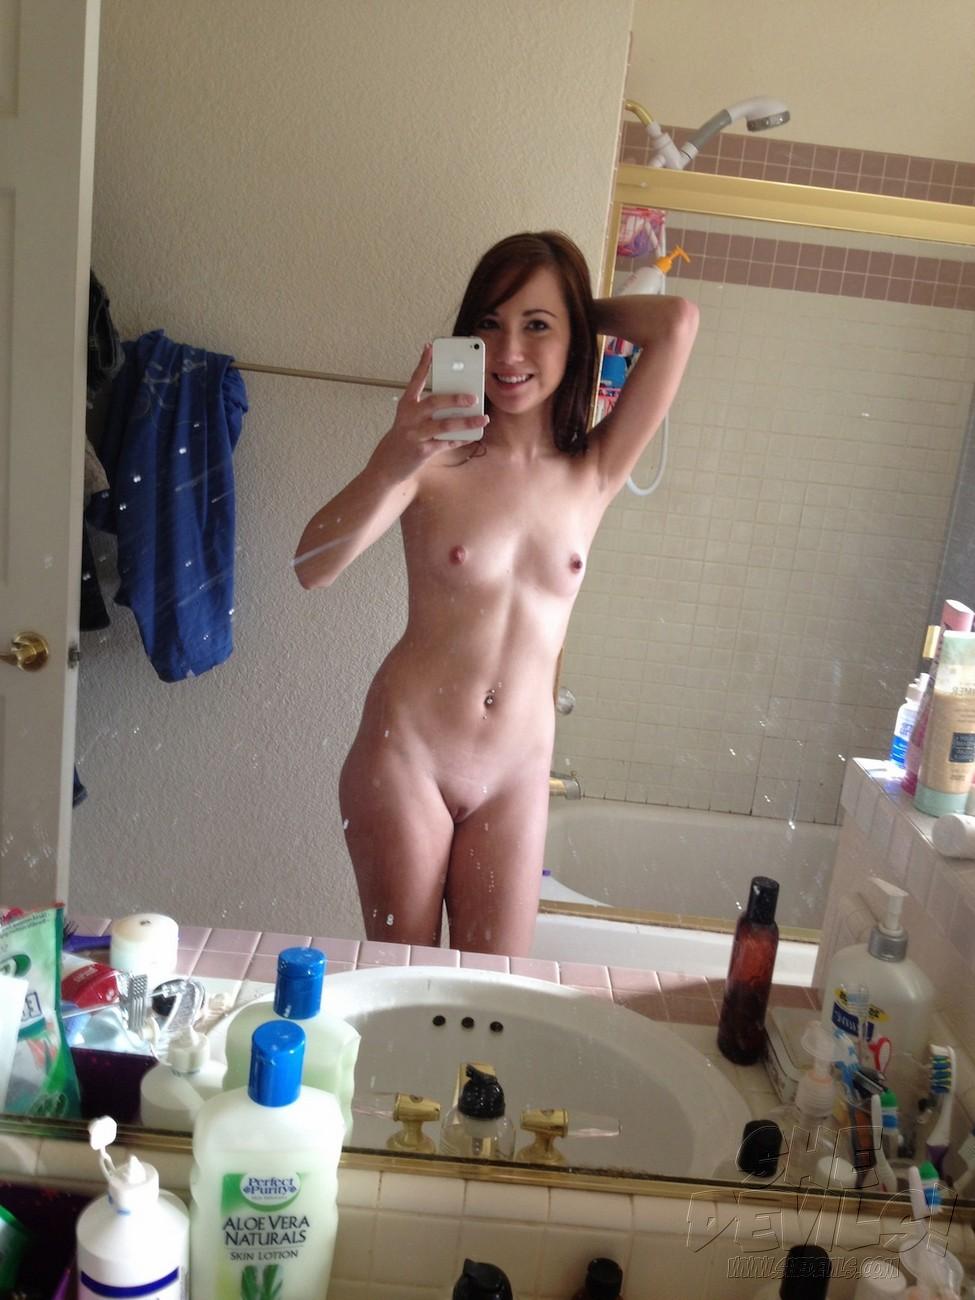 Young jailbait porn pics